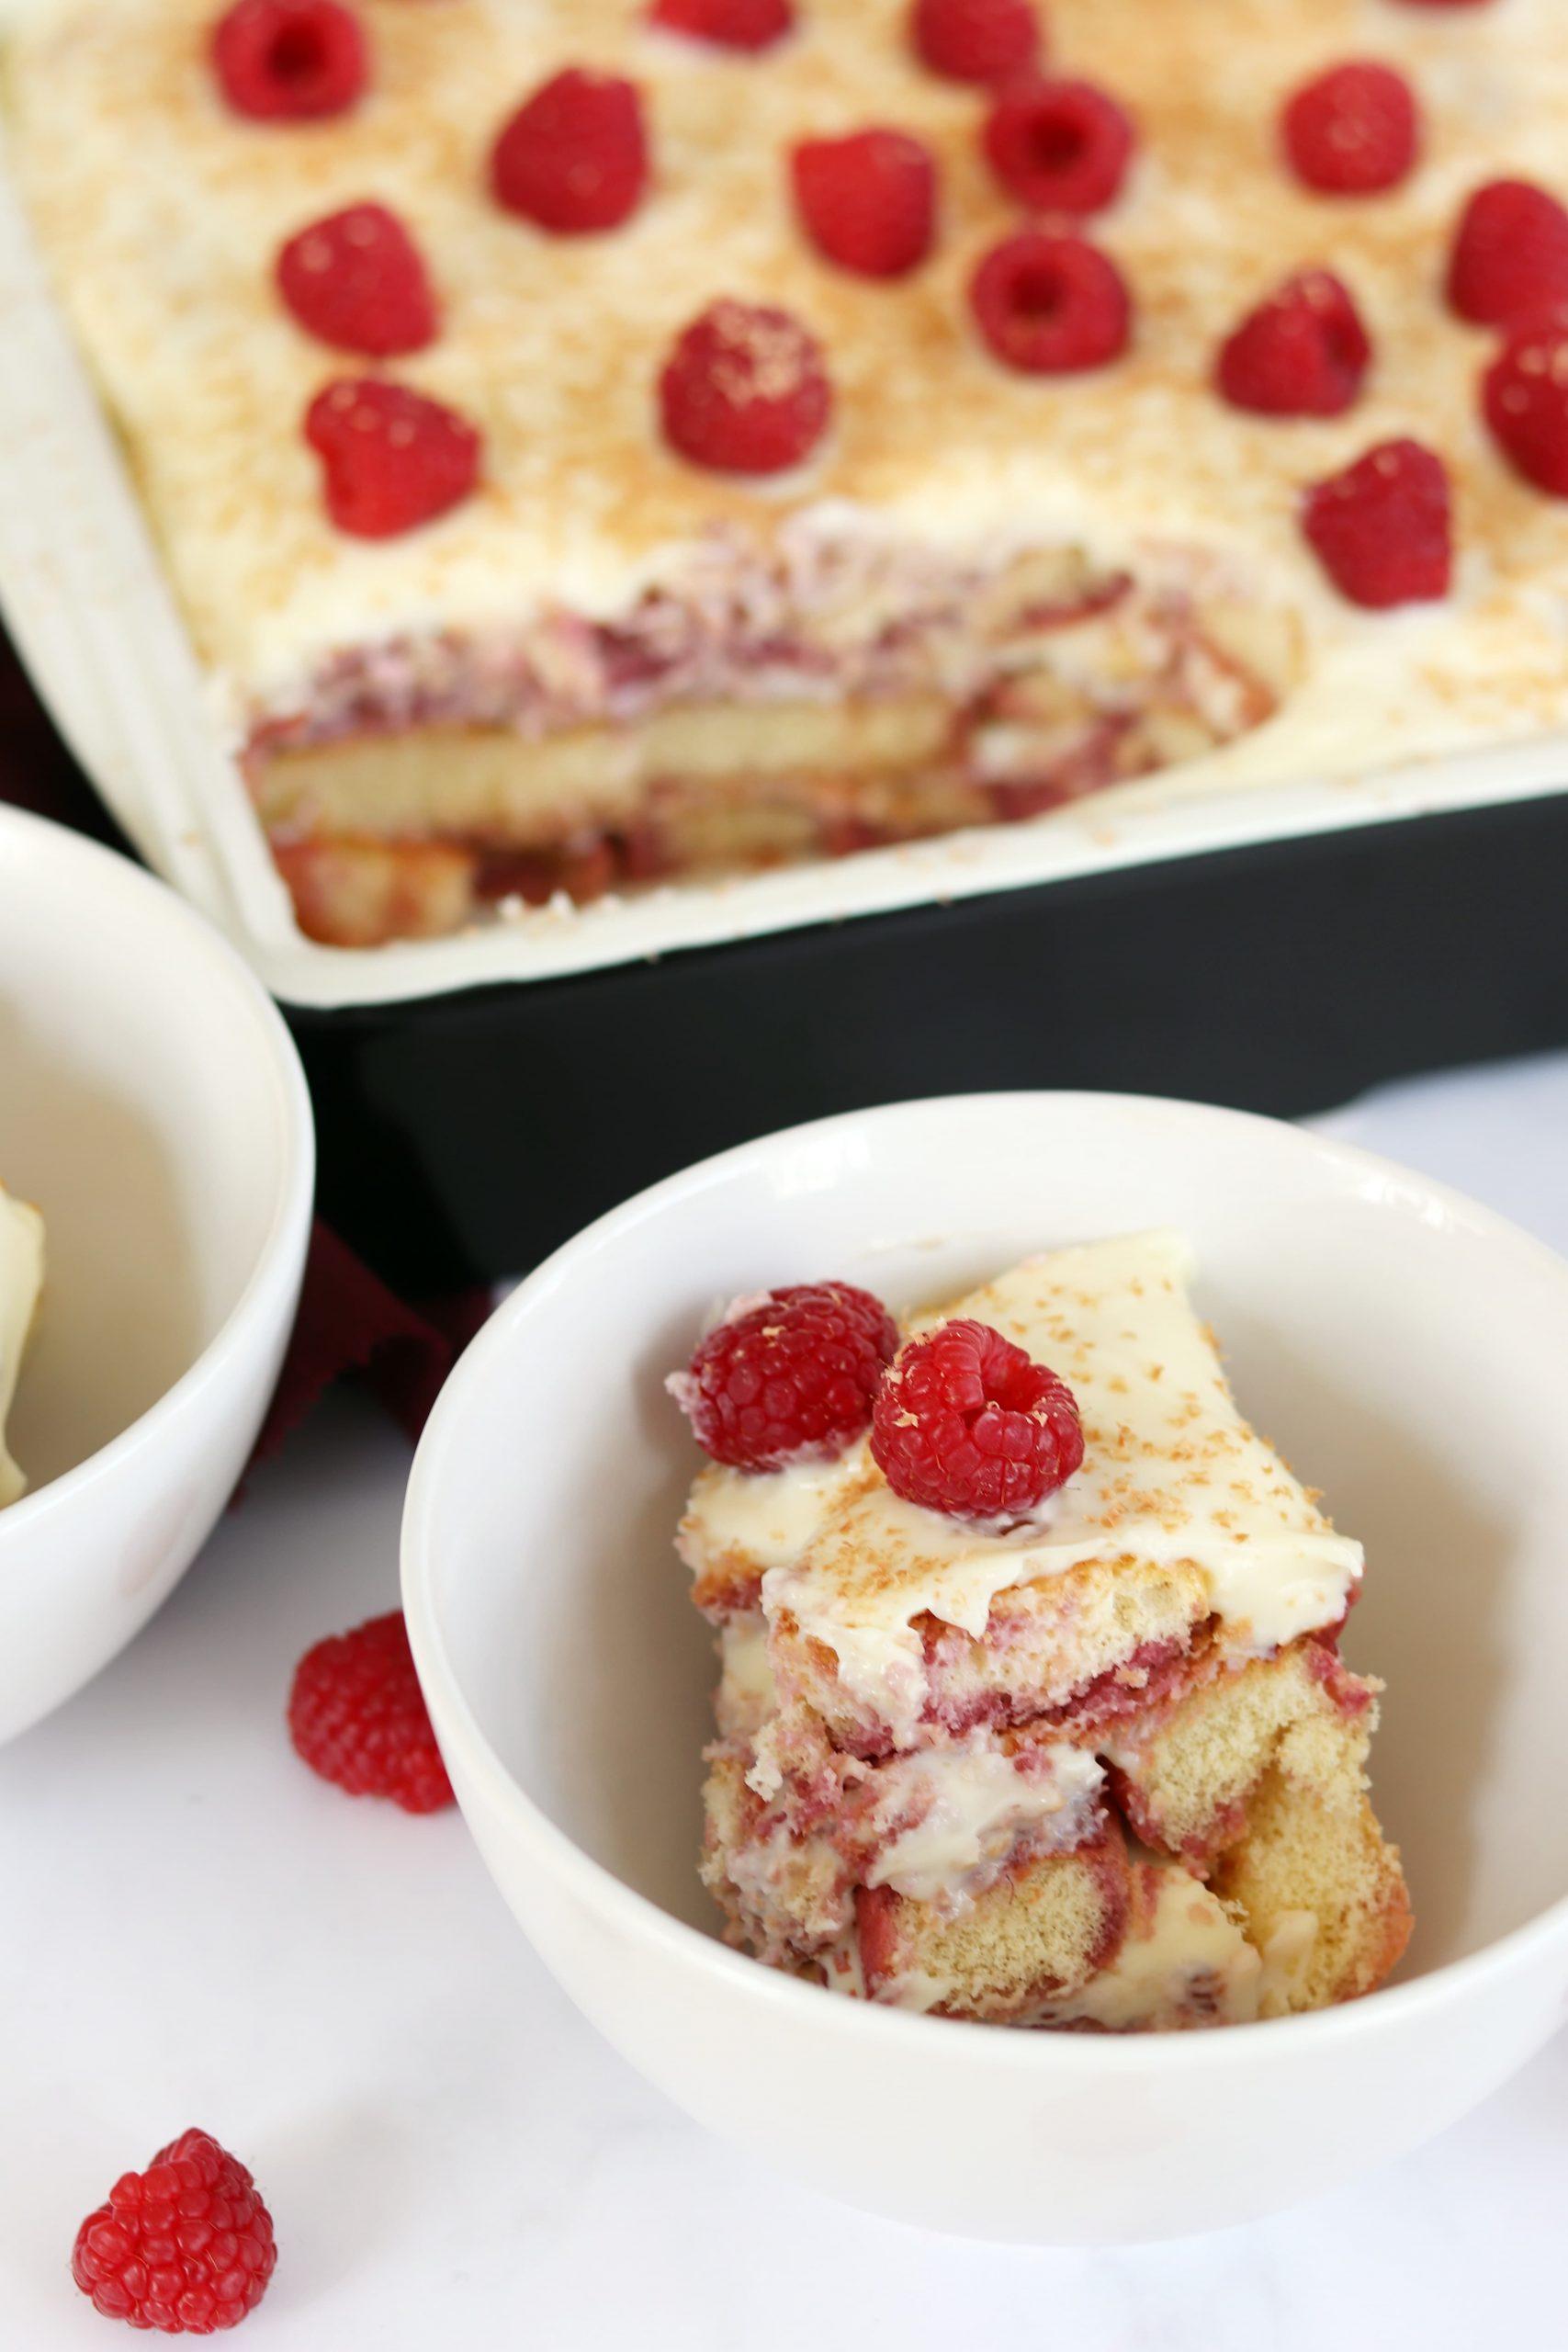 Raspberry Mascarpone Sponge Pudding Curly S Cooking